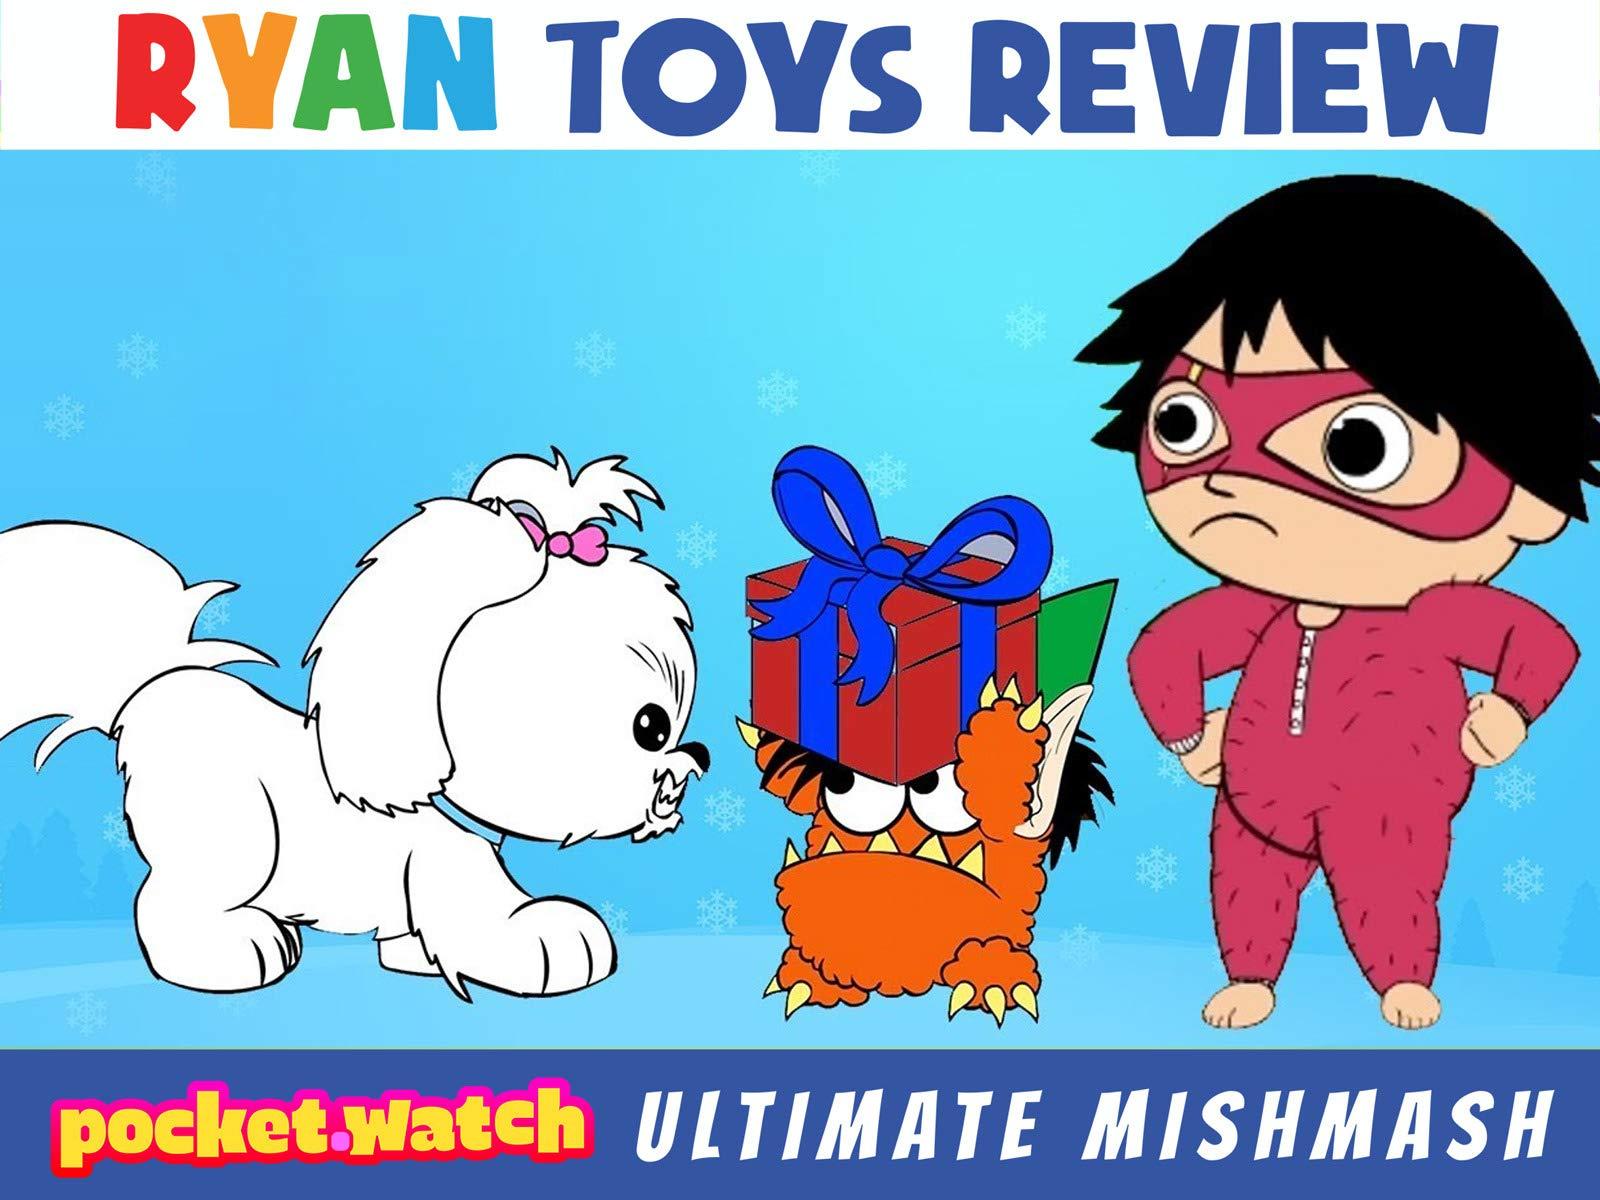 Amazon.com: pocket.watch Ryan Toys Review Ultimate mishmash ...